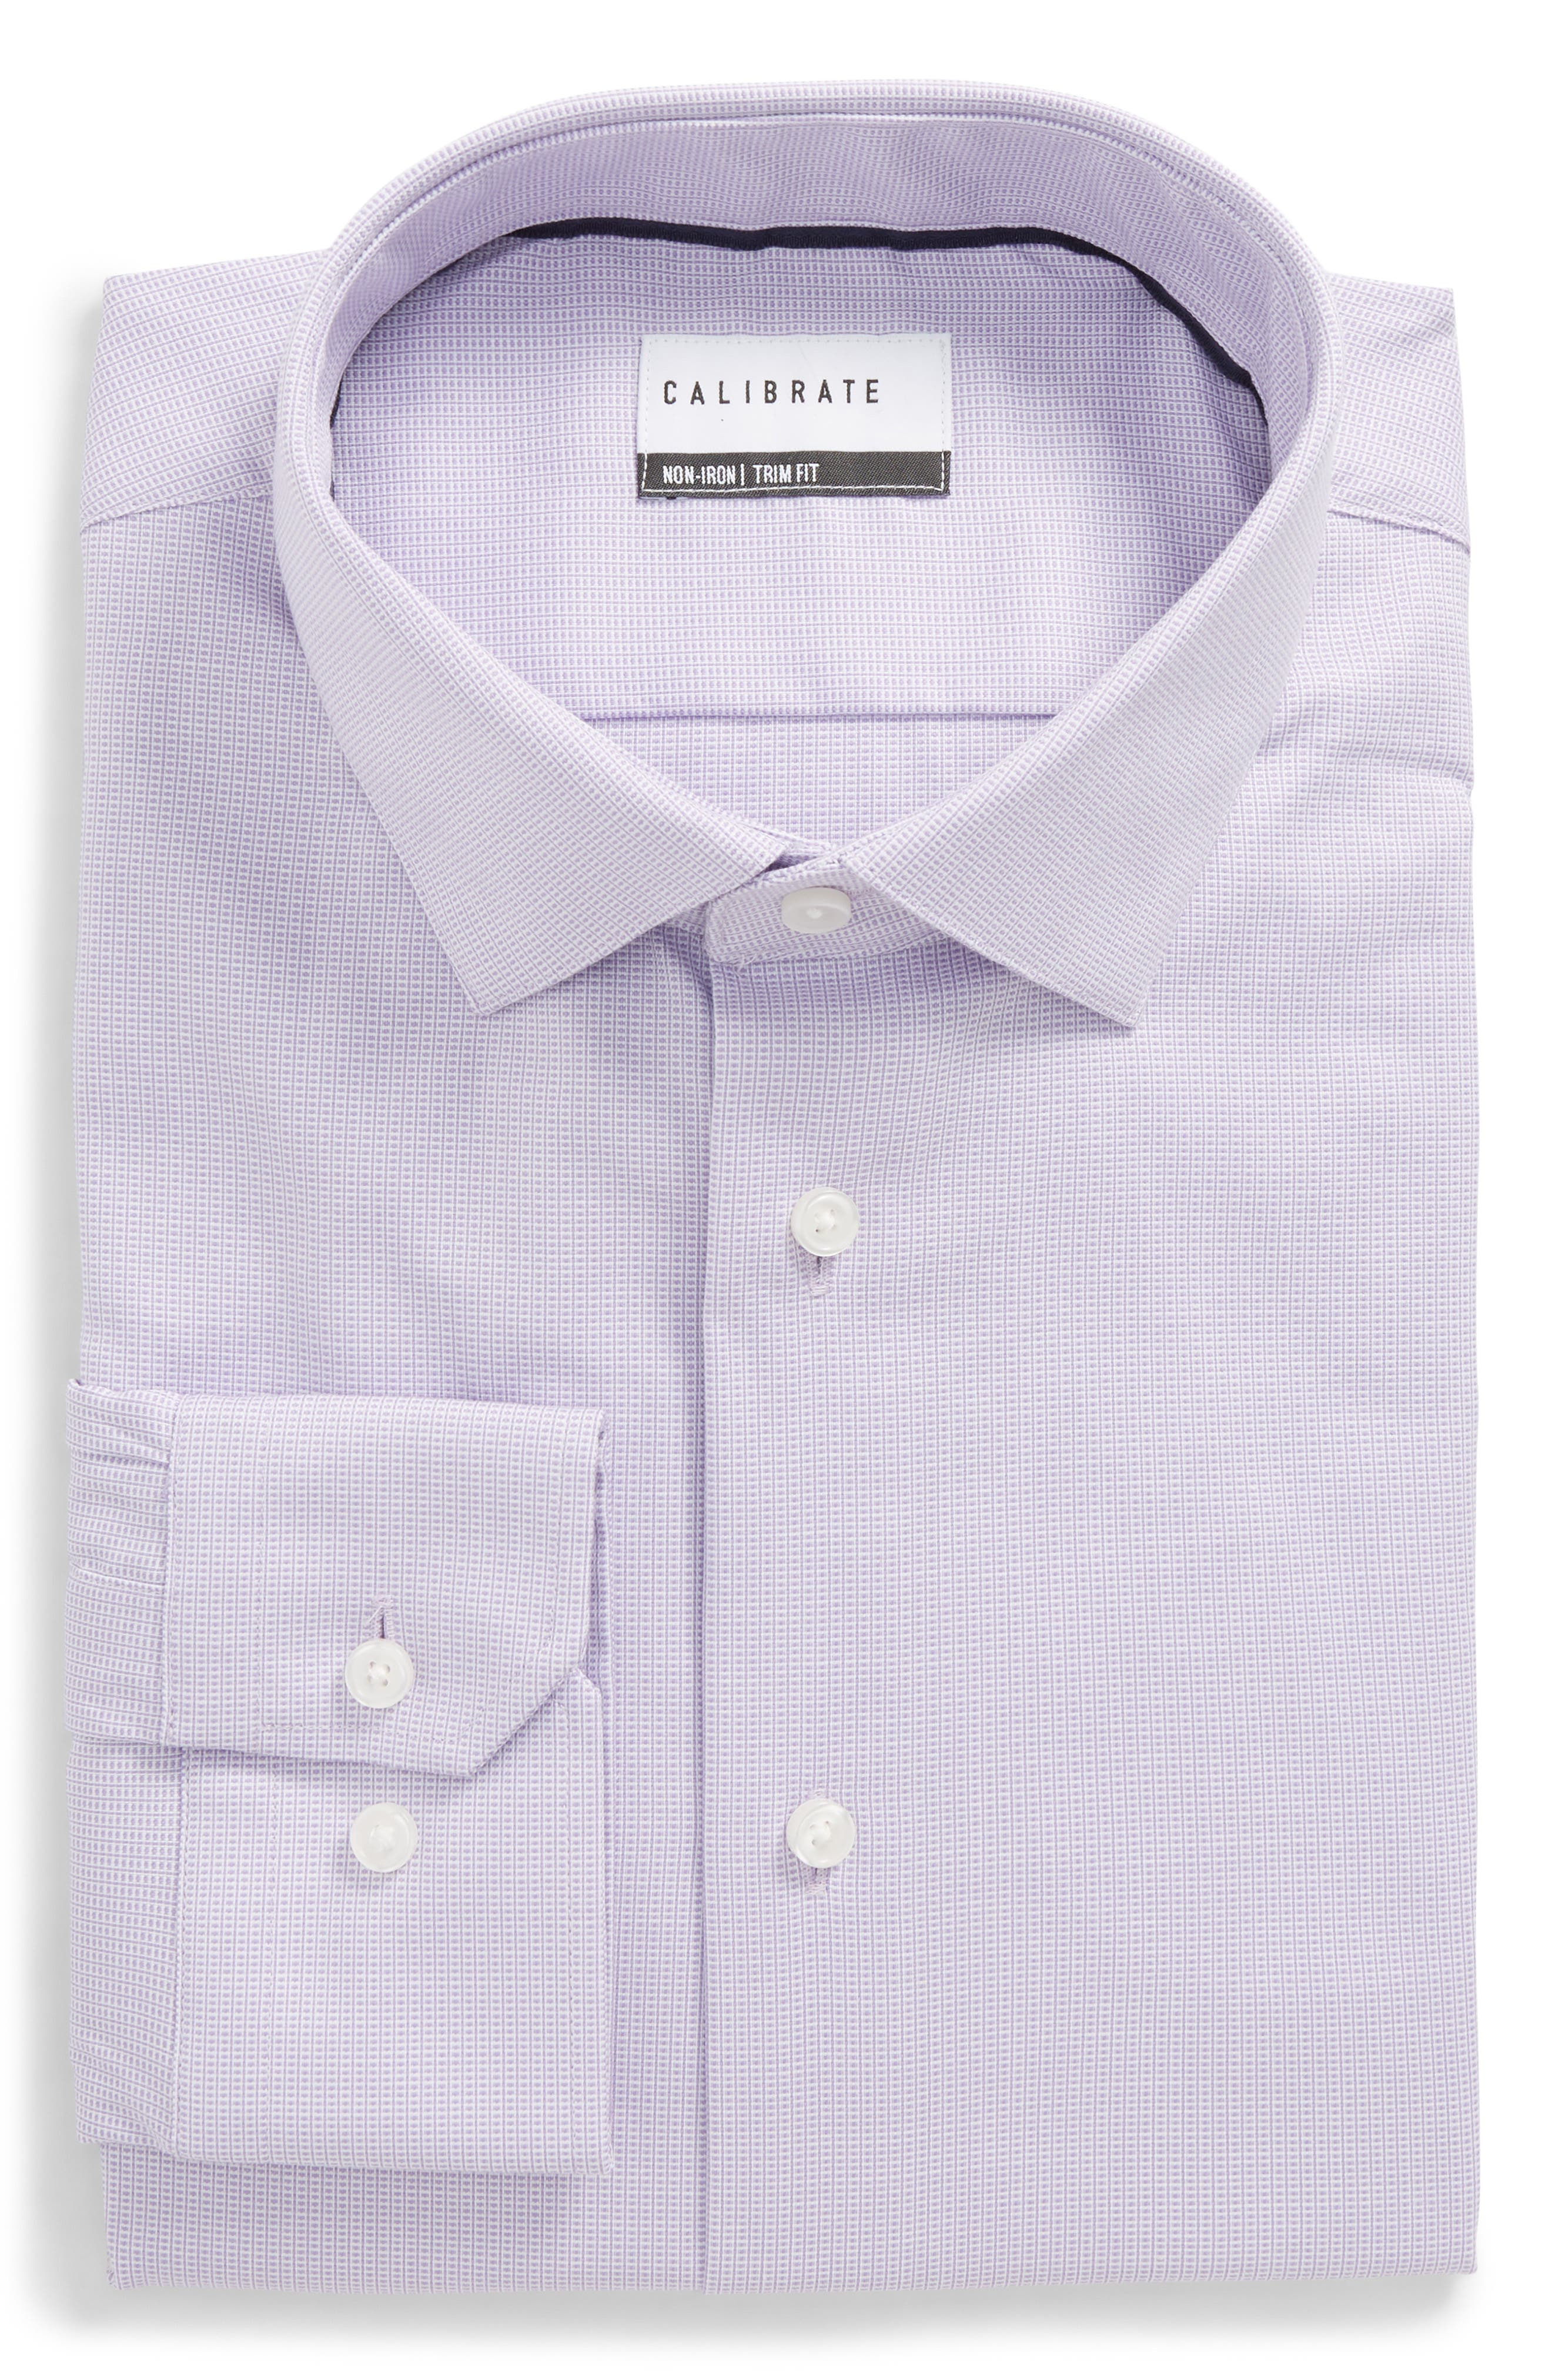 Trim Fit Non-Iron Stretch Dress Shirt,                             Main thumbnail 1, color,                             Purple Rapsody